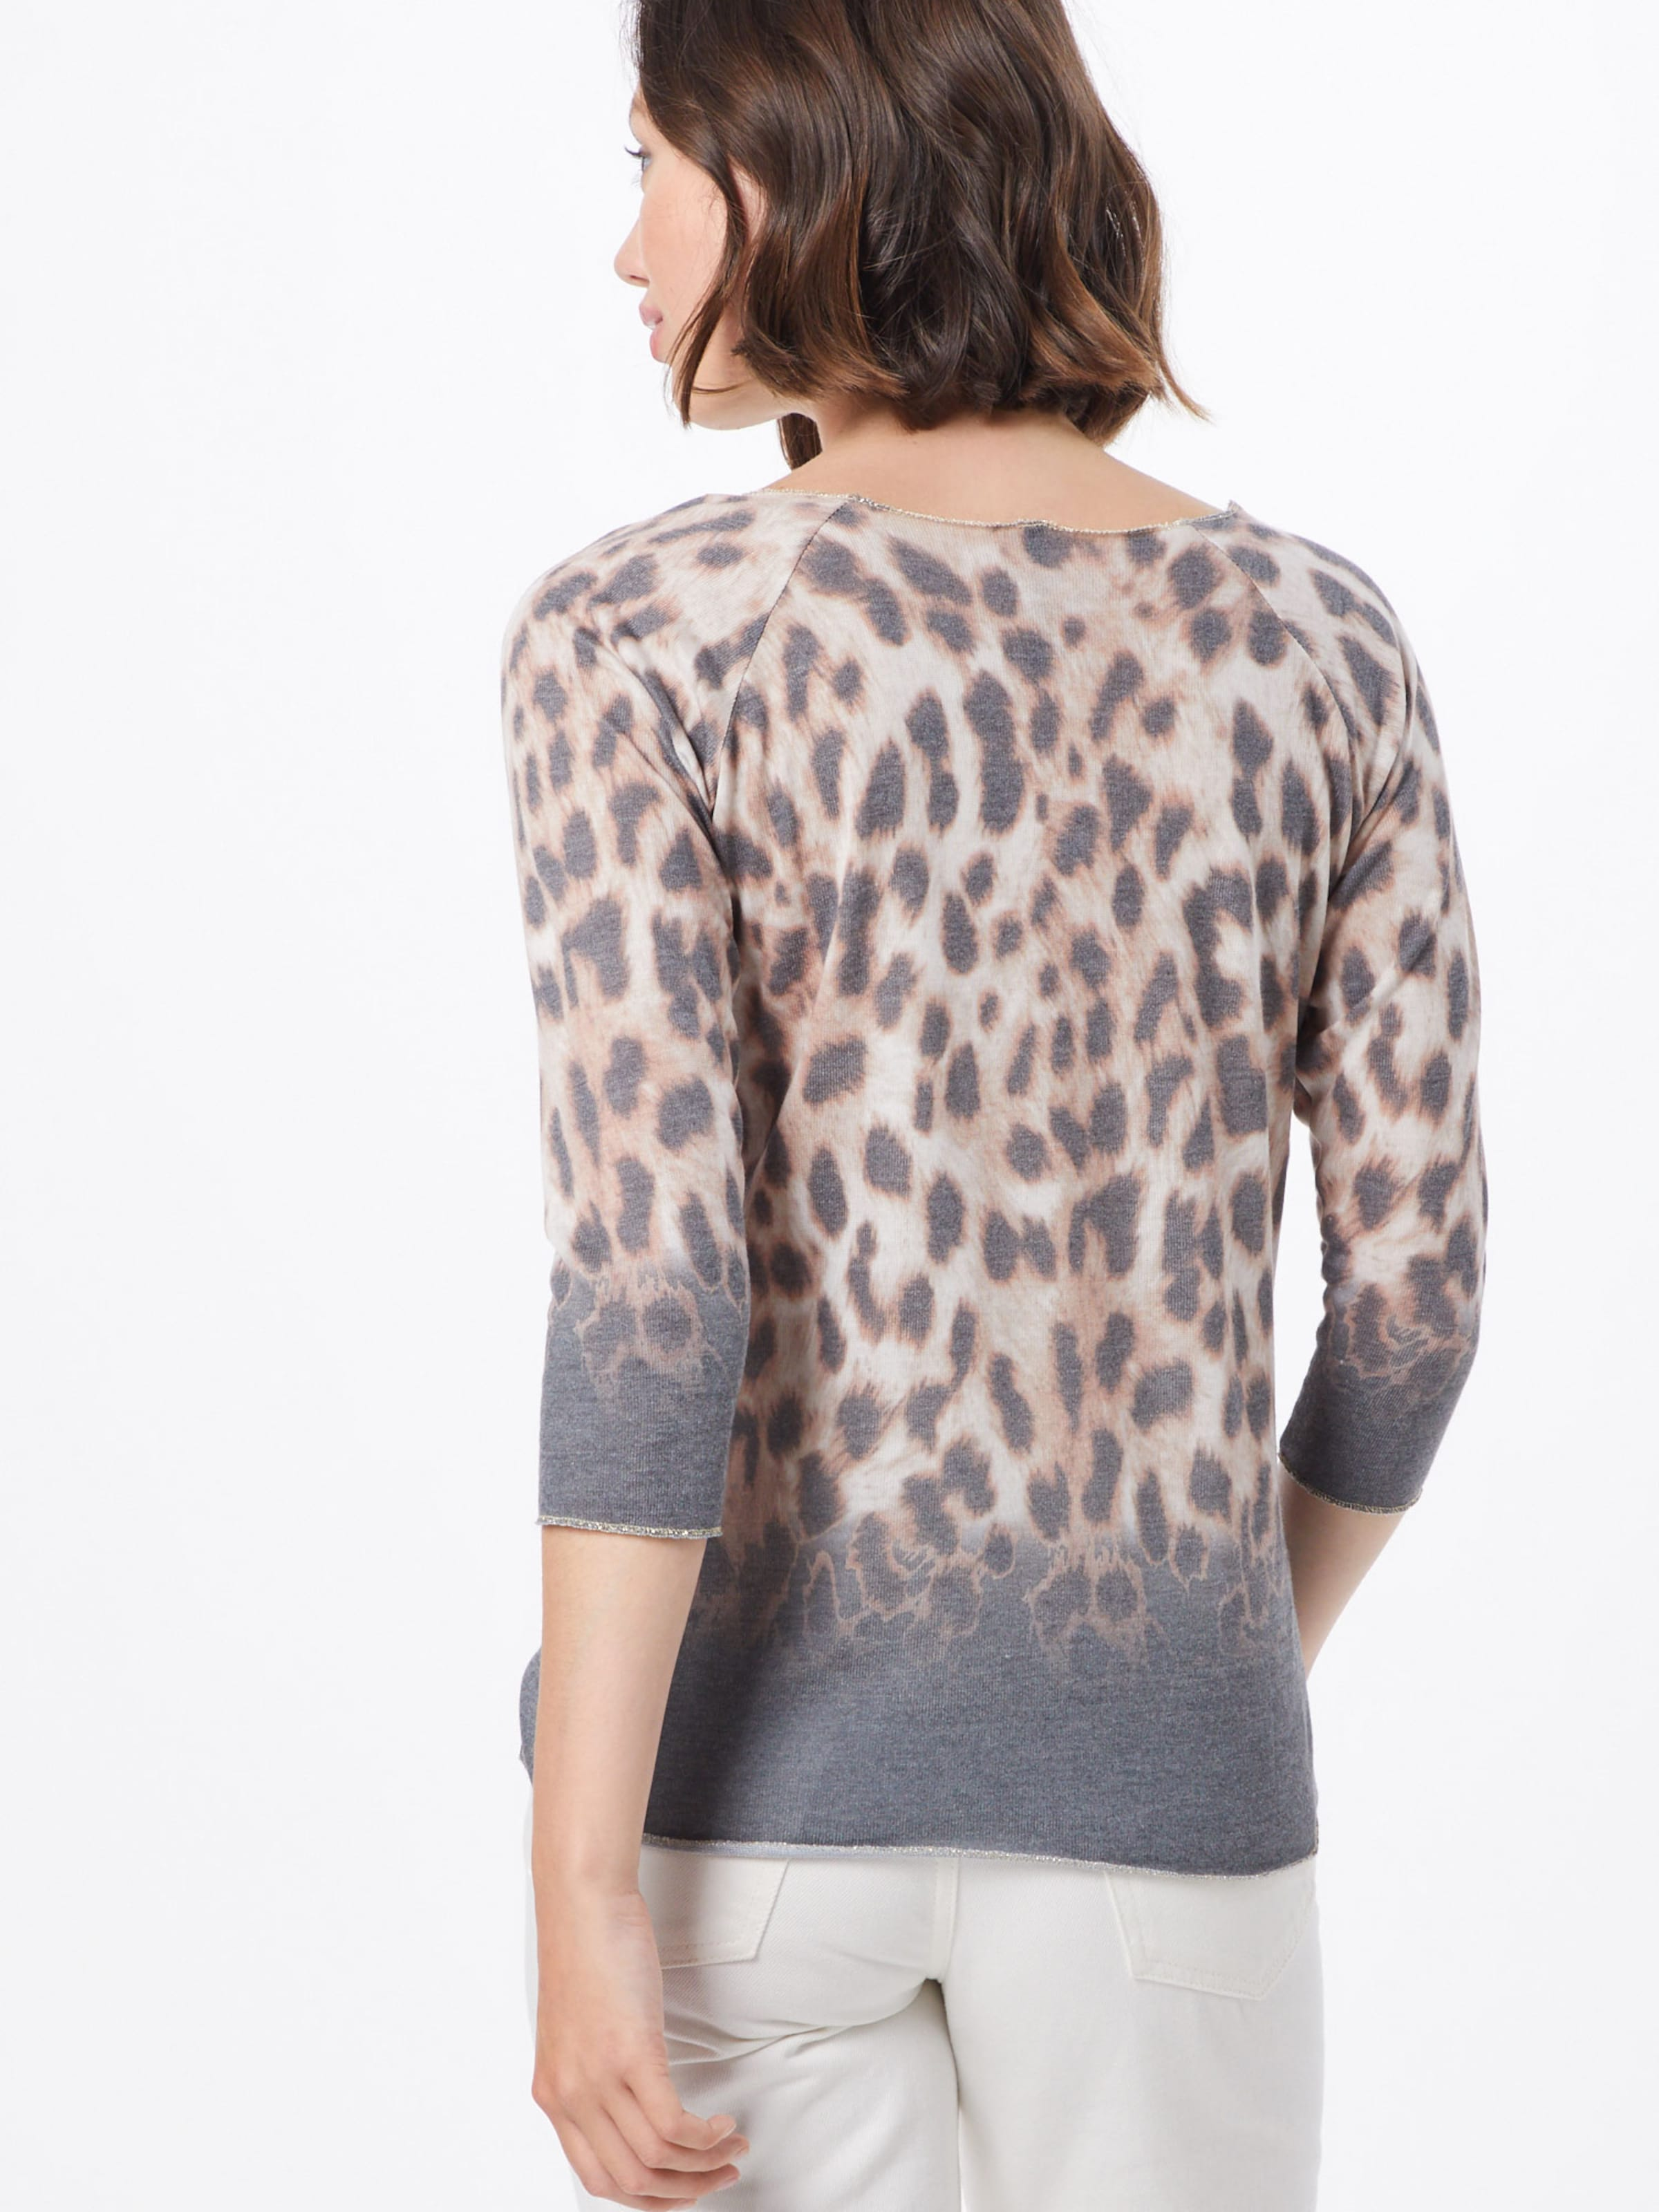 shirt BeigeGris Largo En 'wls T Key Loved' PnO80wk